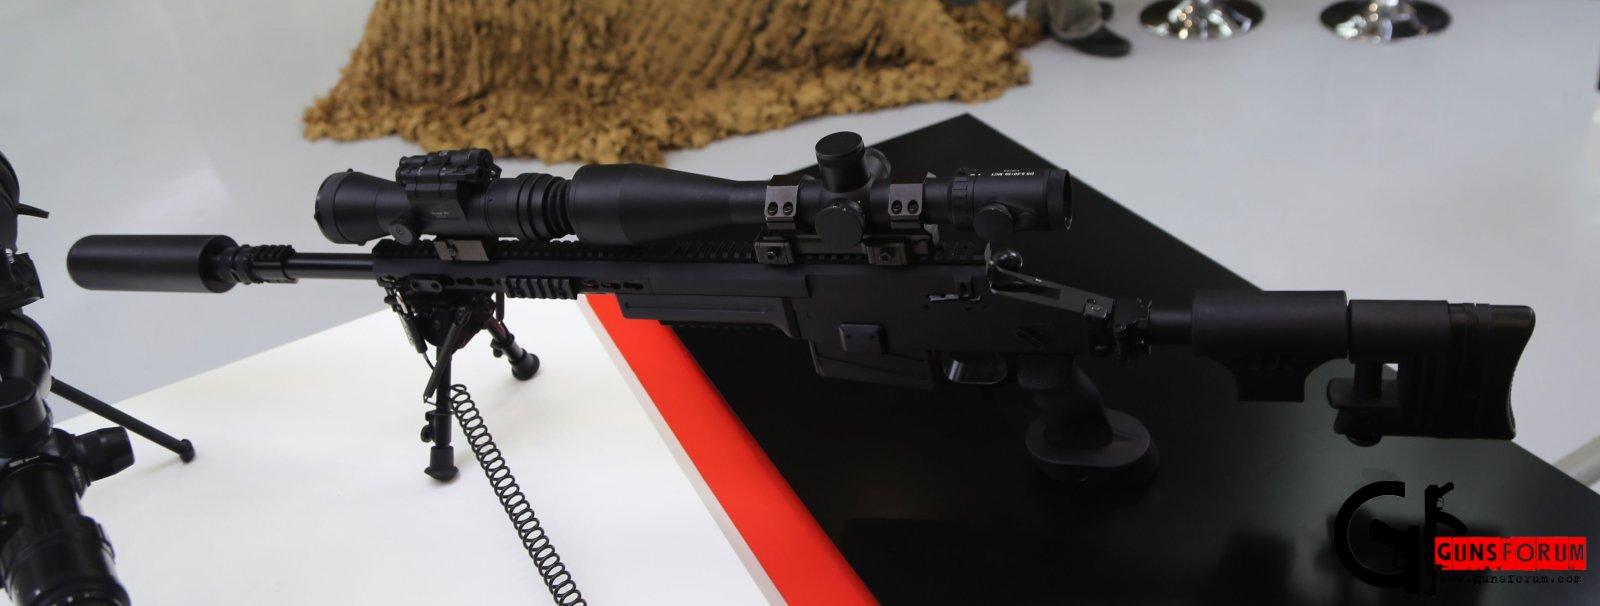 "снайперская винтовка от ""Калашникова"", на этот раз под .338lm"